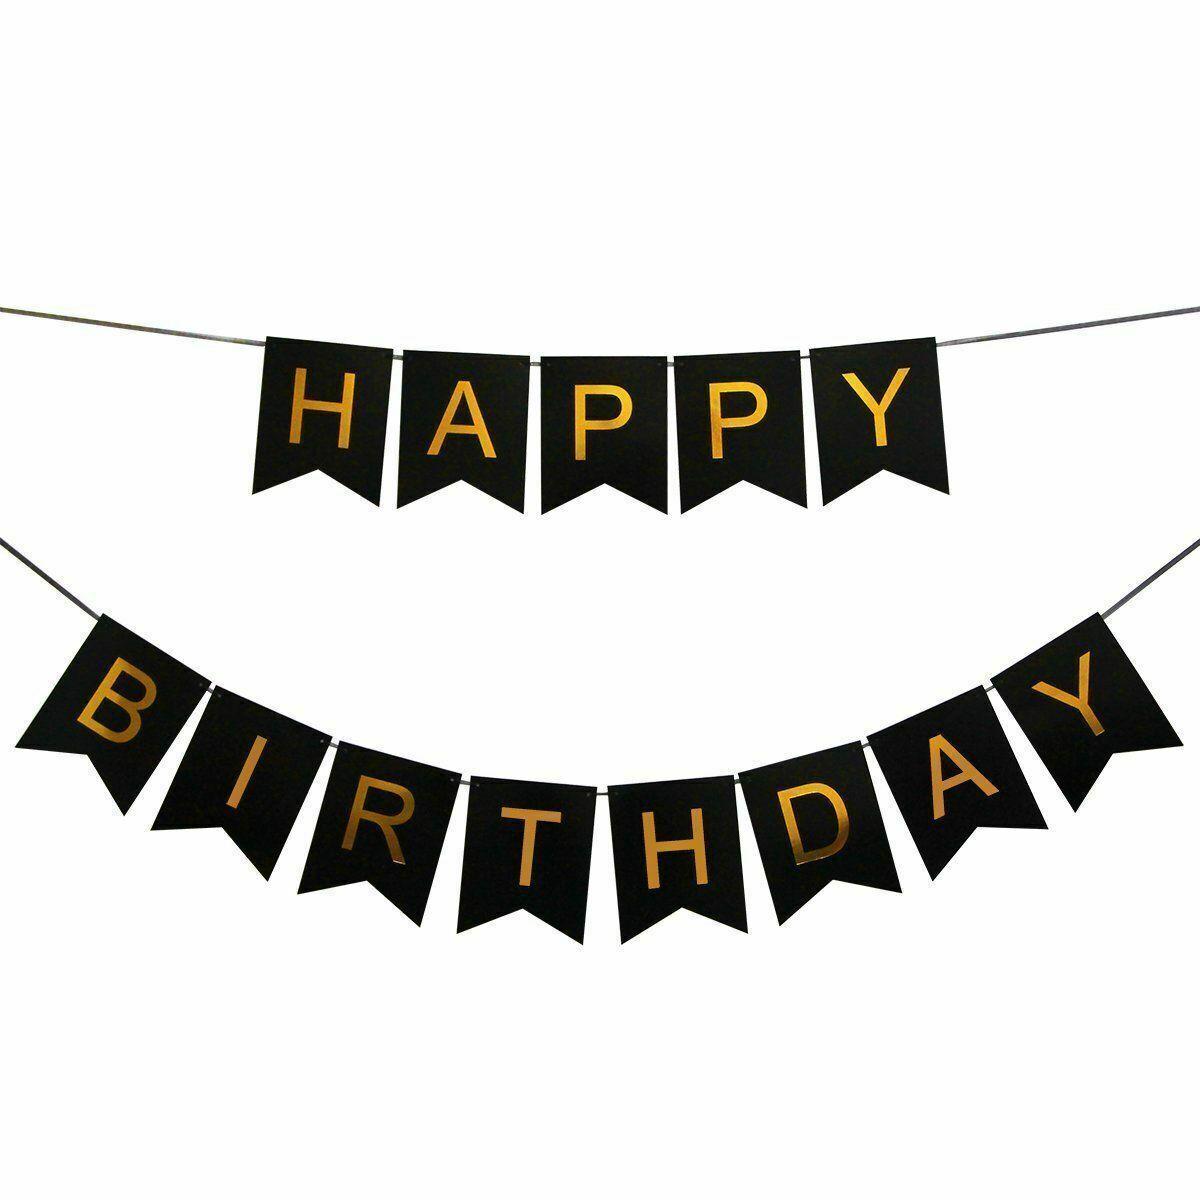 Happy Birthday Balloons Banner Balloon Bunting Party Decoration Hanging Garland